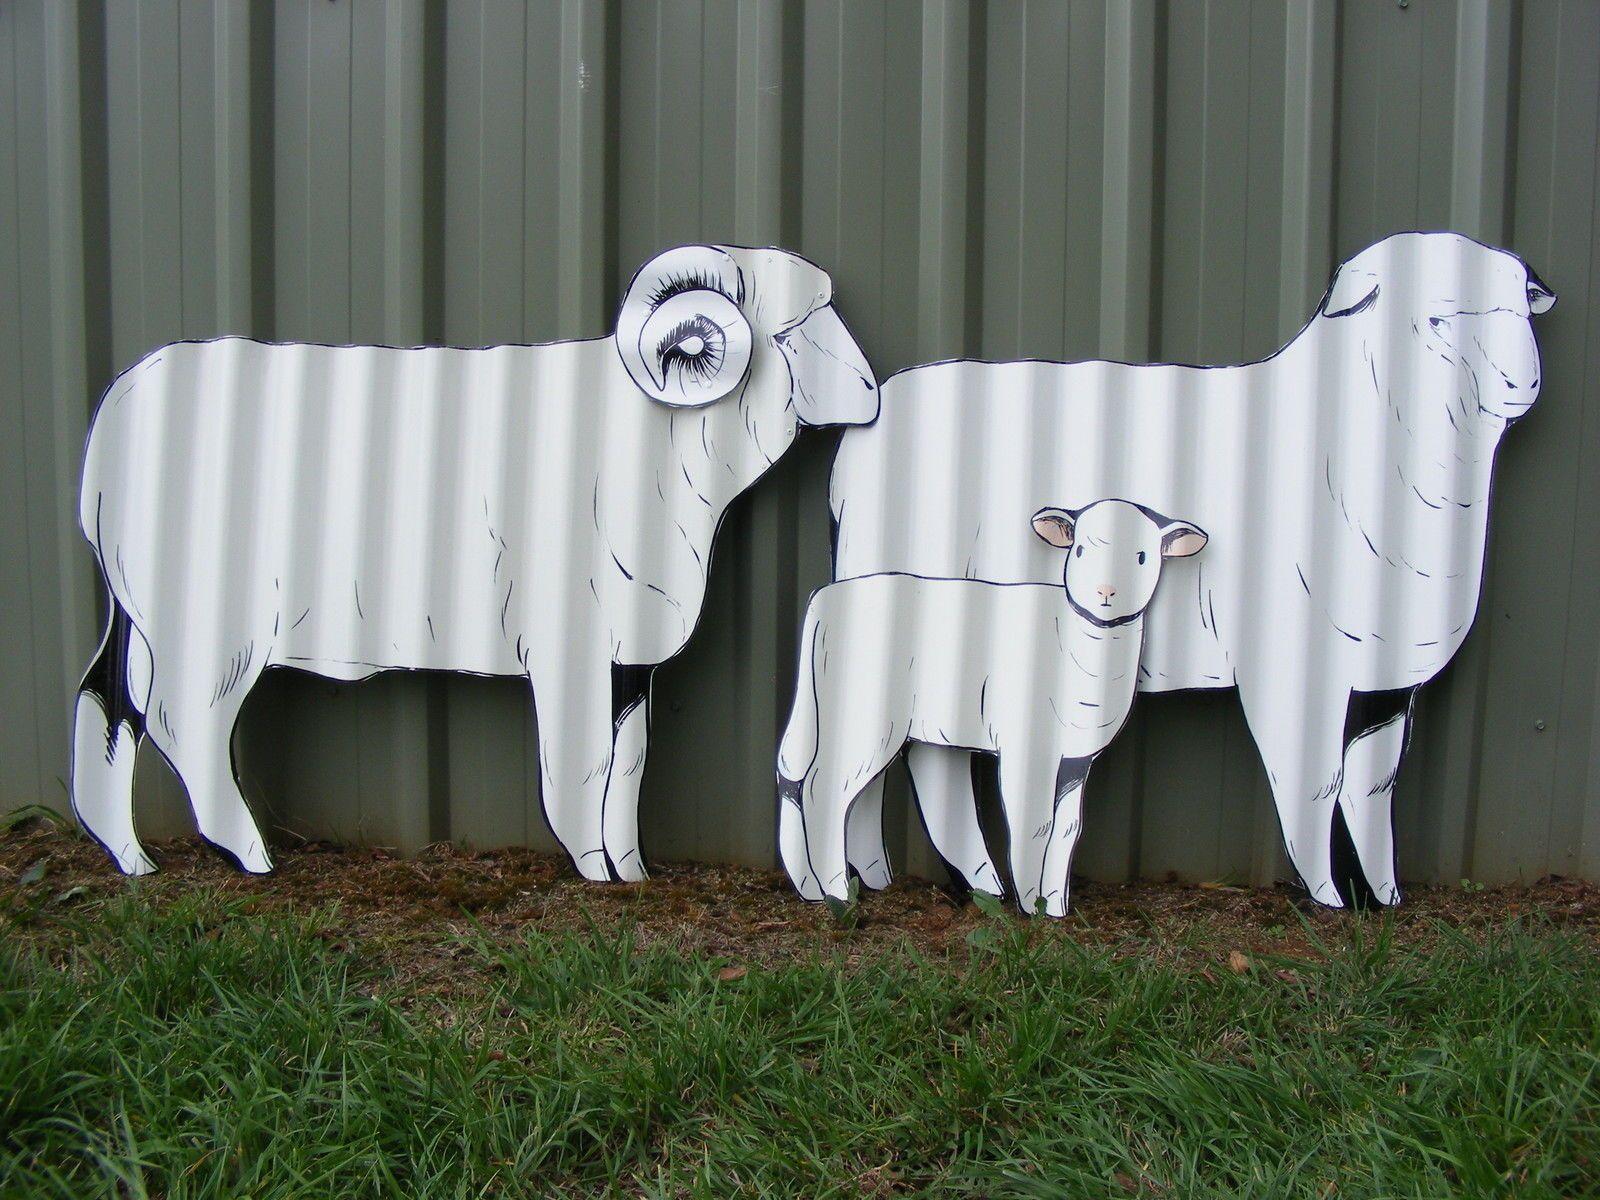 Sheep Set Aussie Handpainted Corrugated Iron Garden Ornament Yard Art Sculptures In Home Outdoor Living Décor Ebay